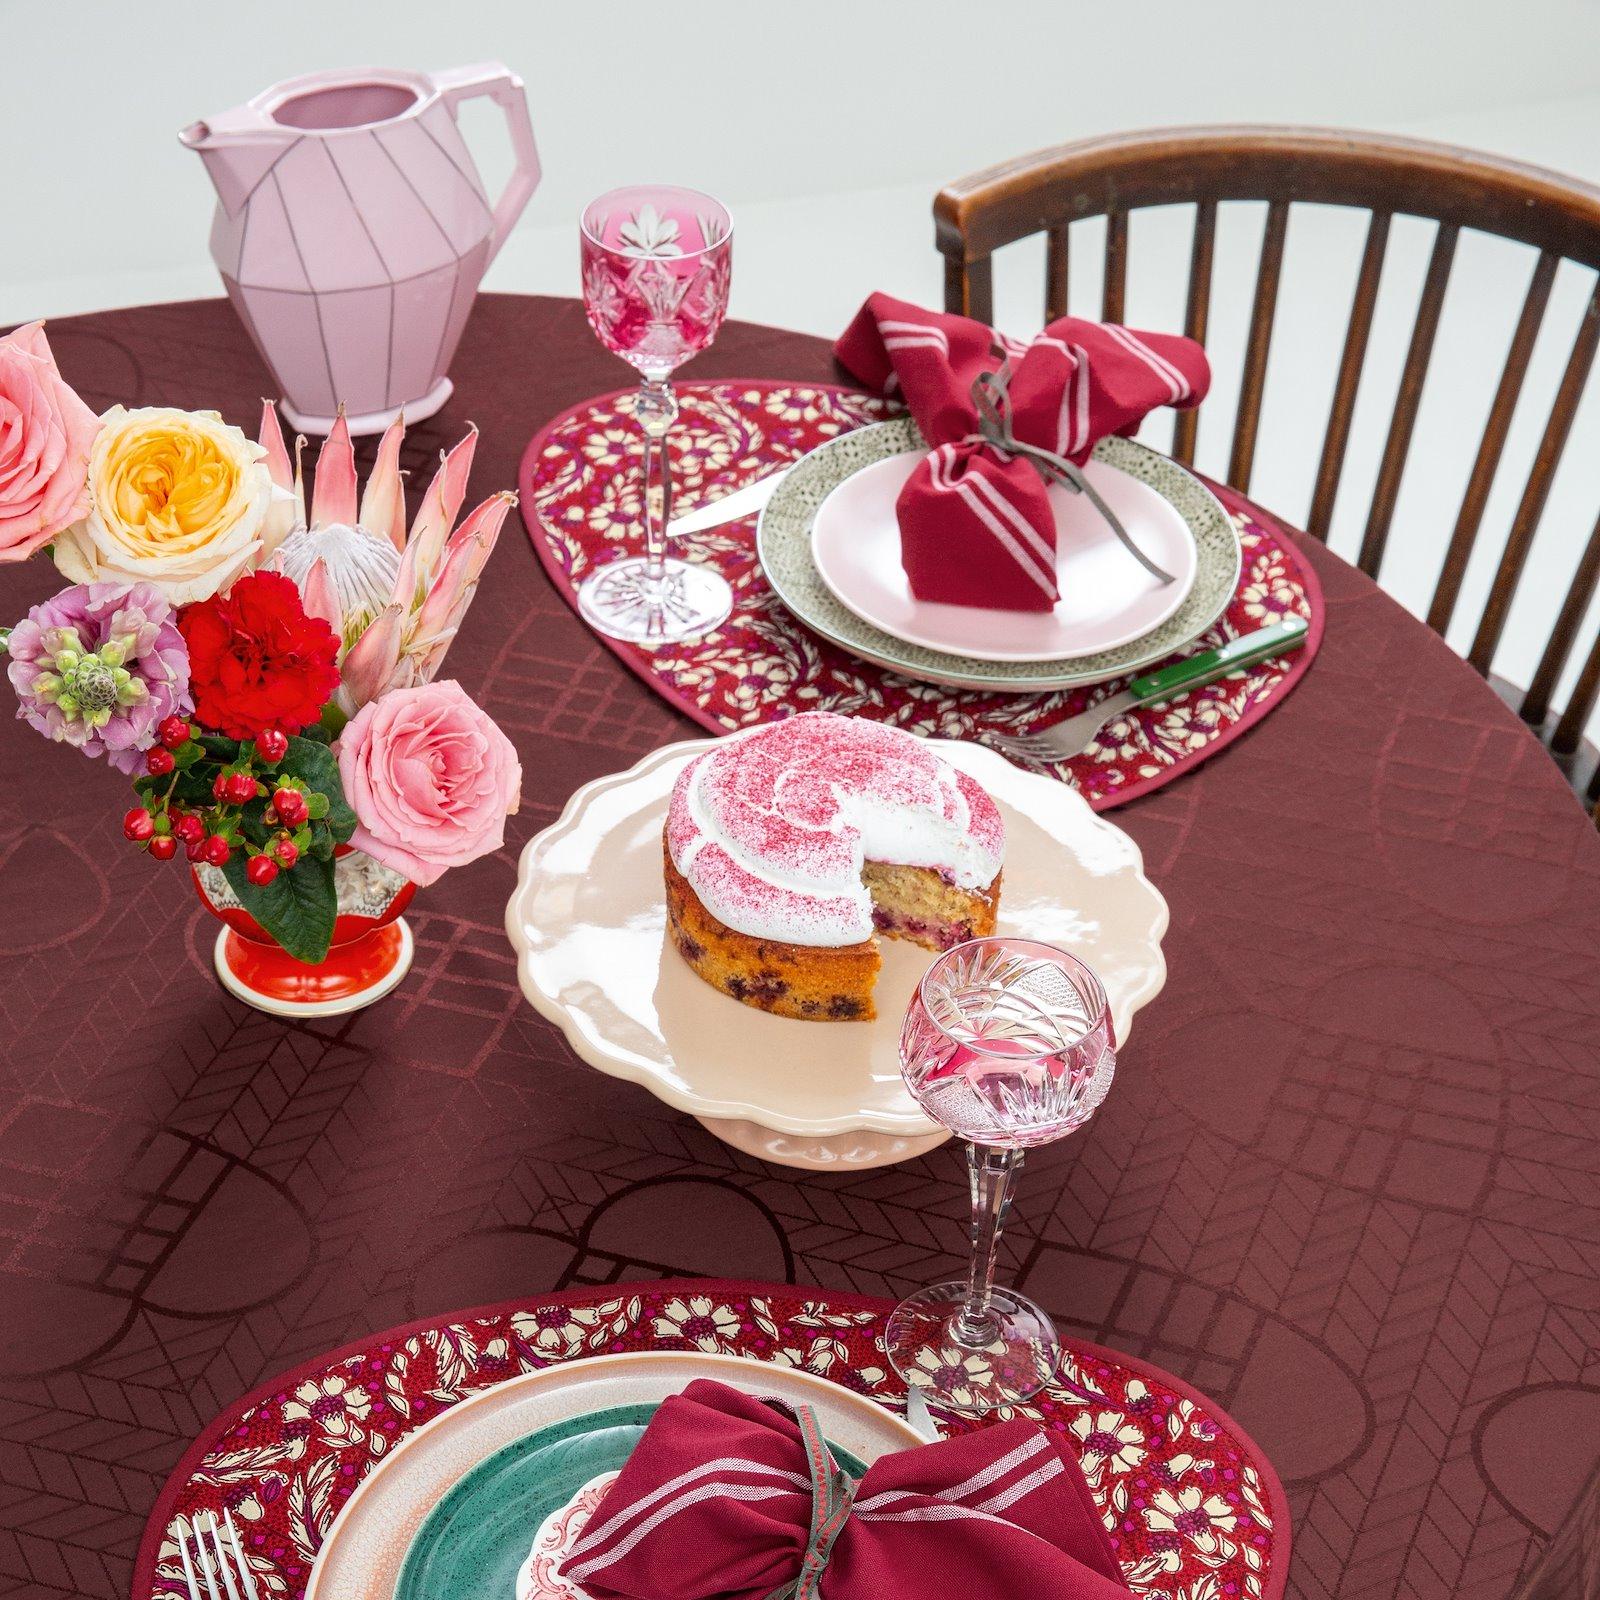 Woven yarn dyed red/off white stripe 803819_p90340_780571_66014_DIY8003_816257_bundle